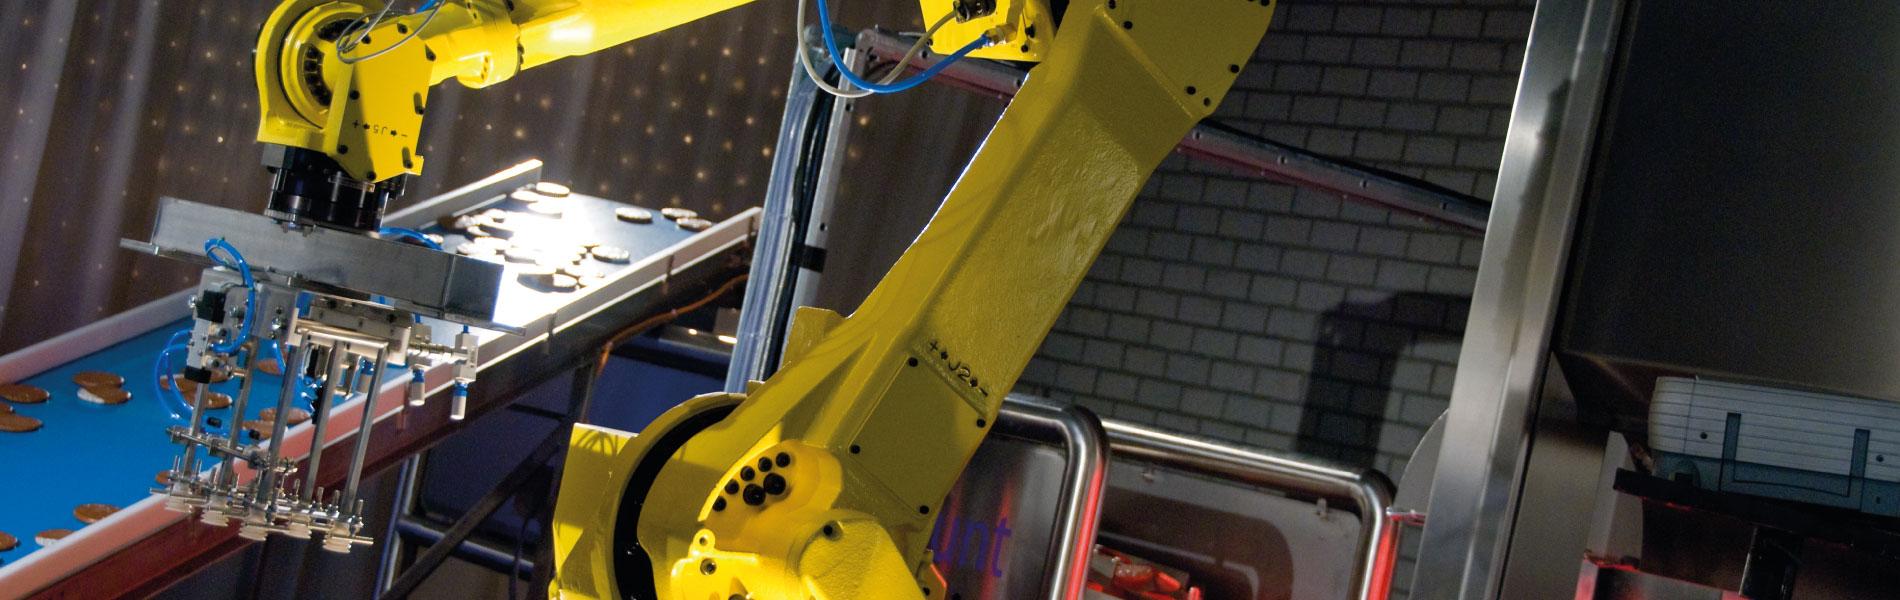 Productierobots